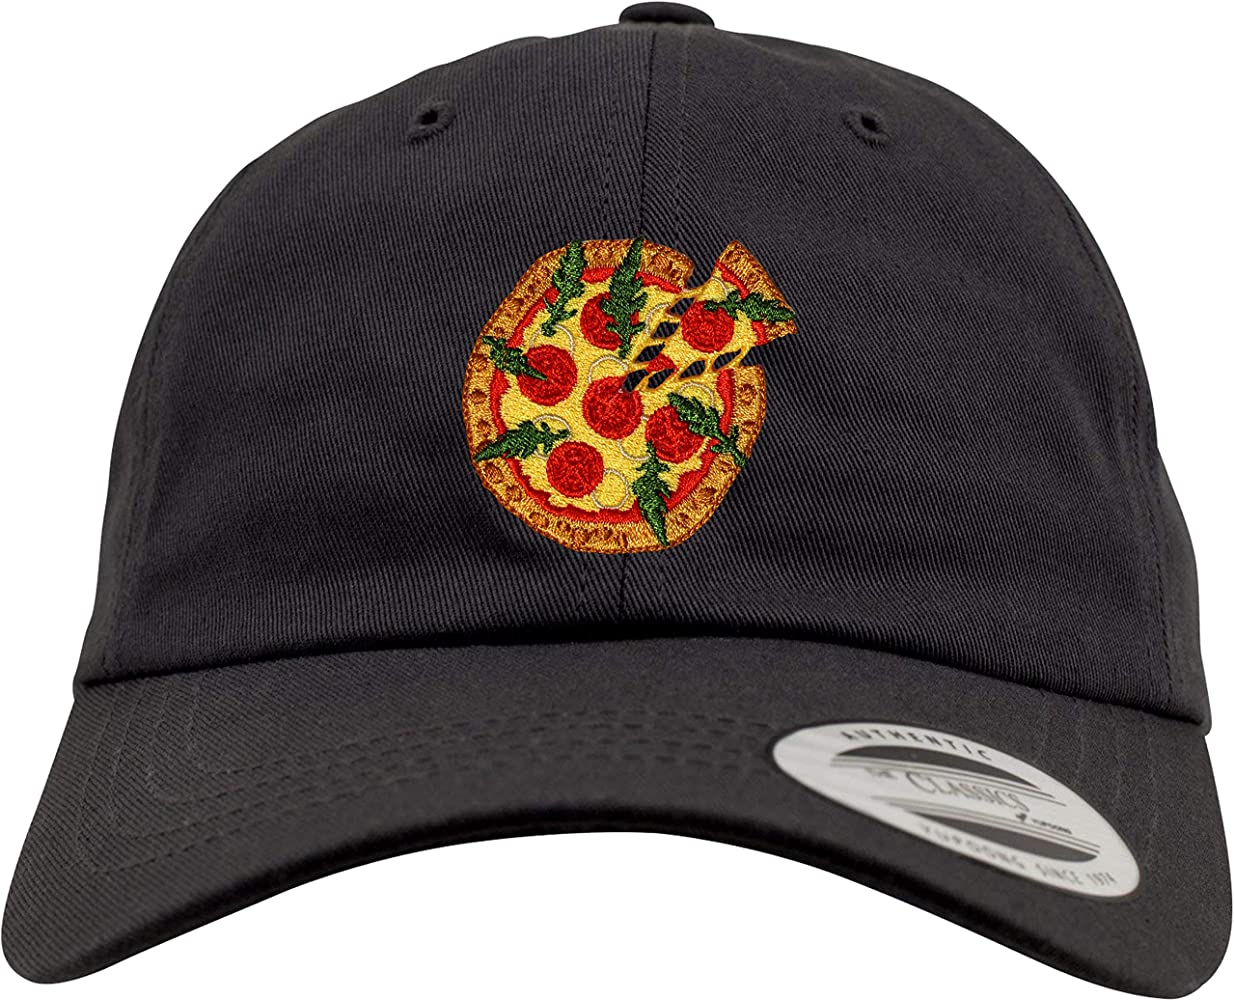 New Flexfit Basecap: Pizza - Gorra de béisbol - Bordado - Low ...